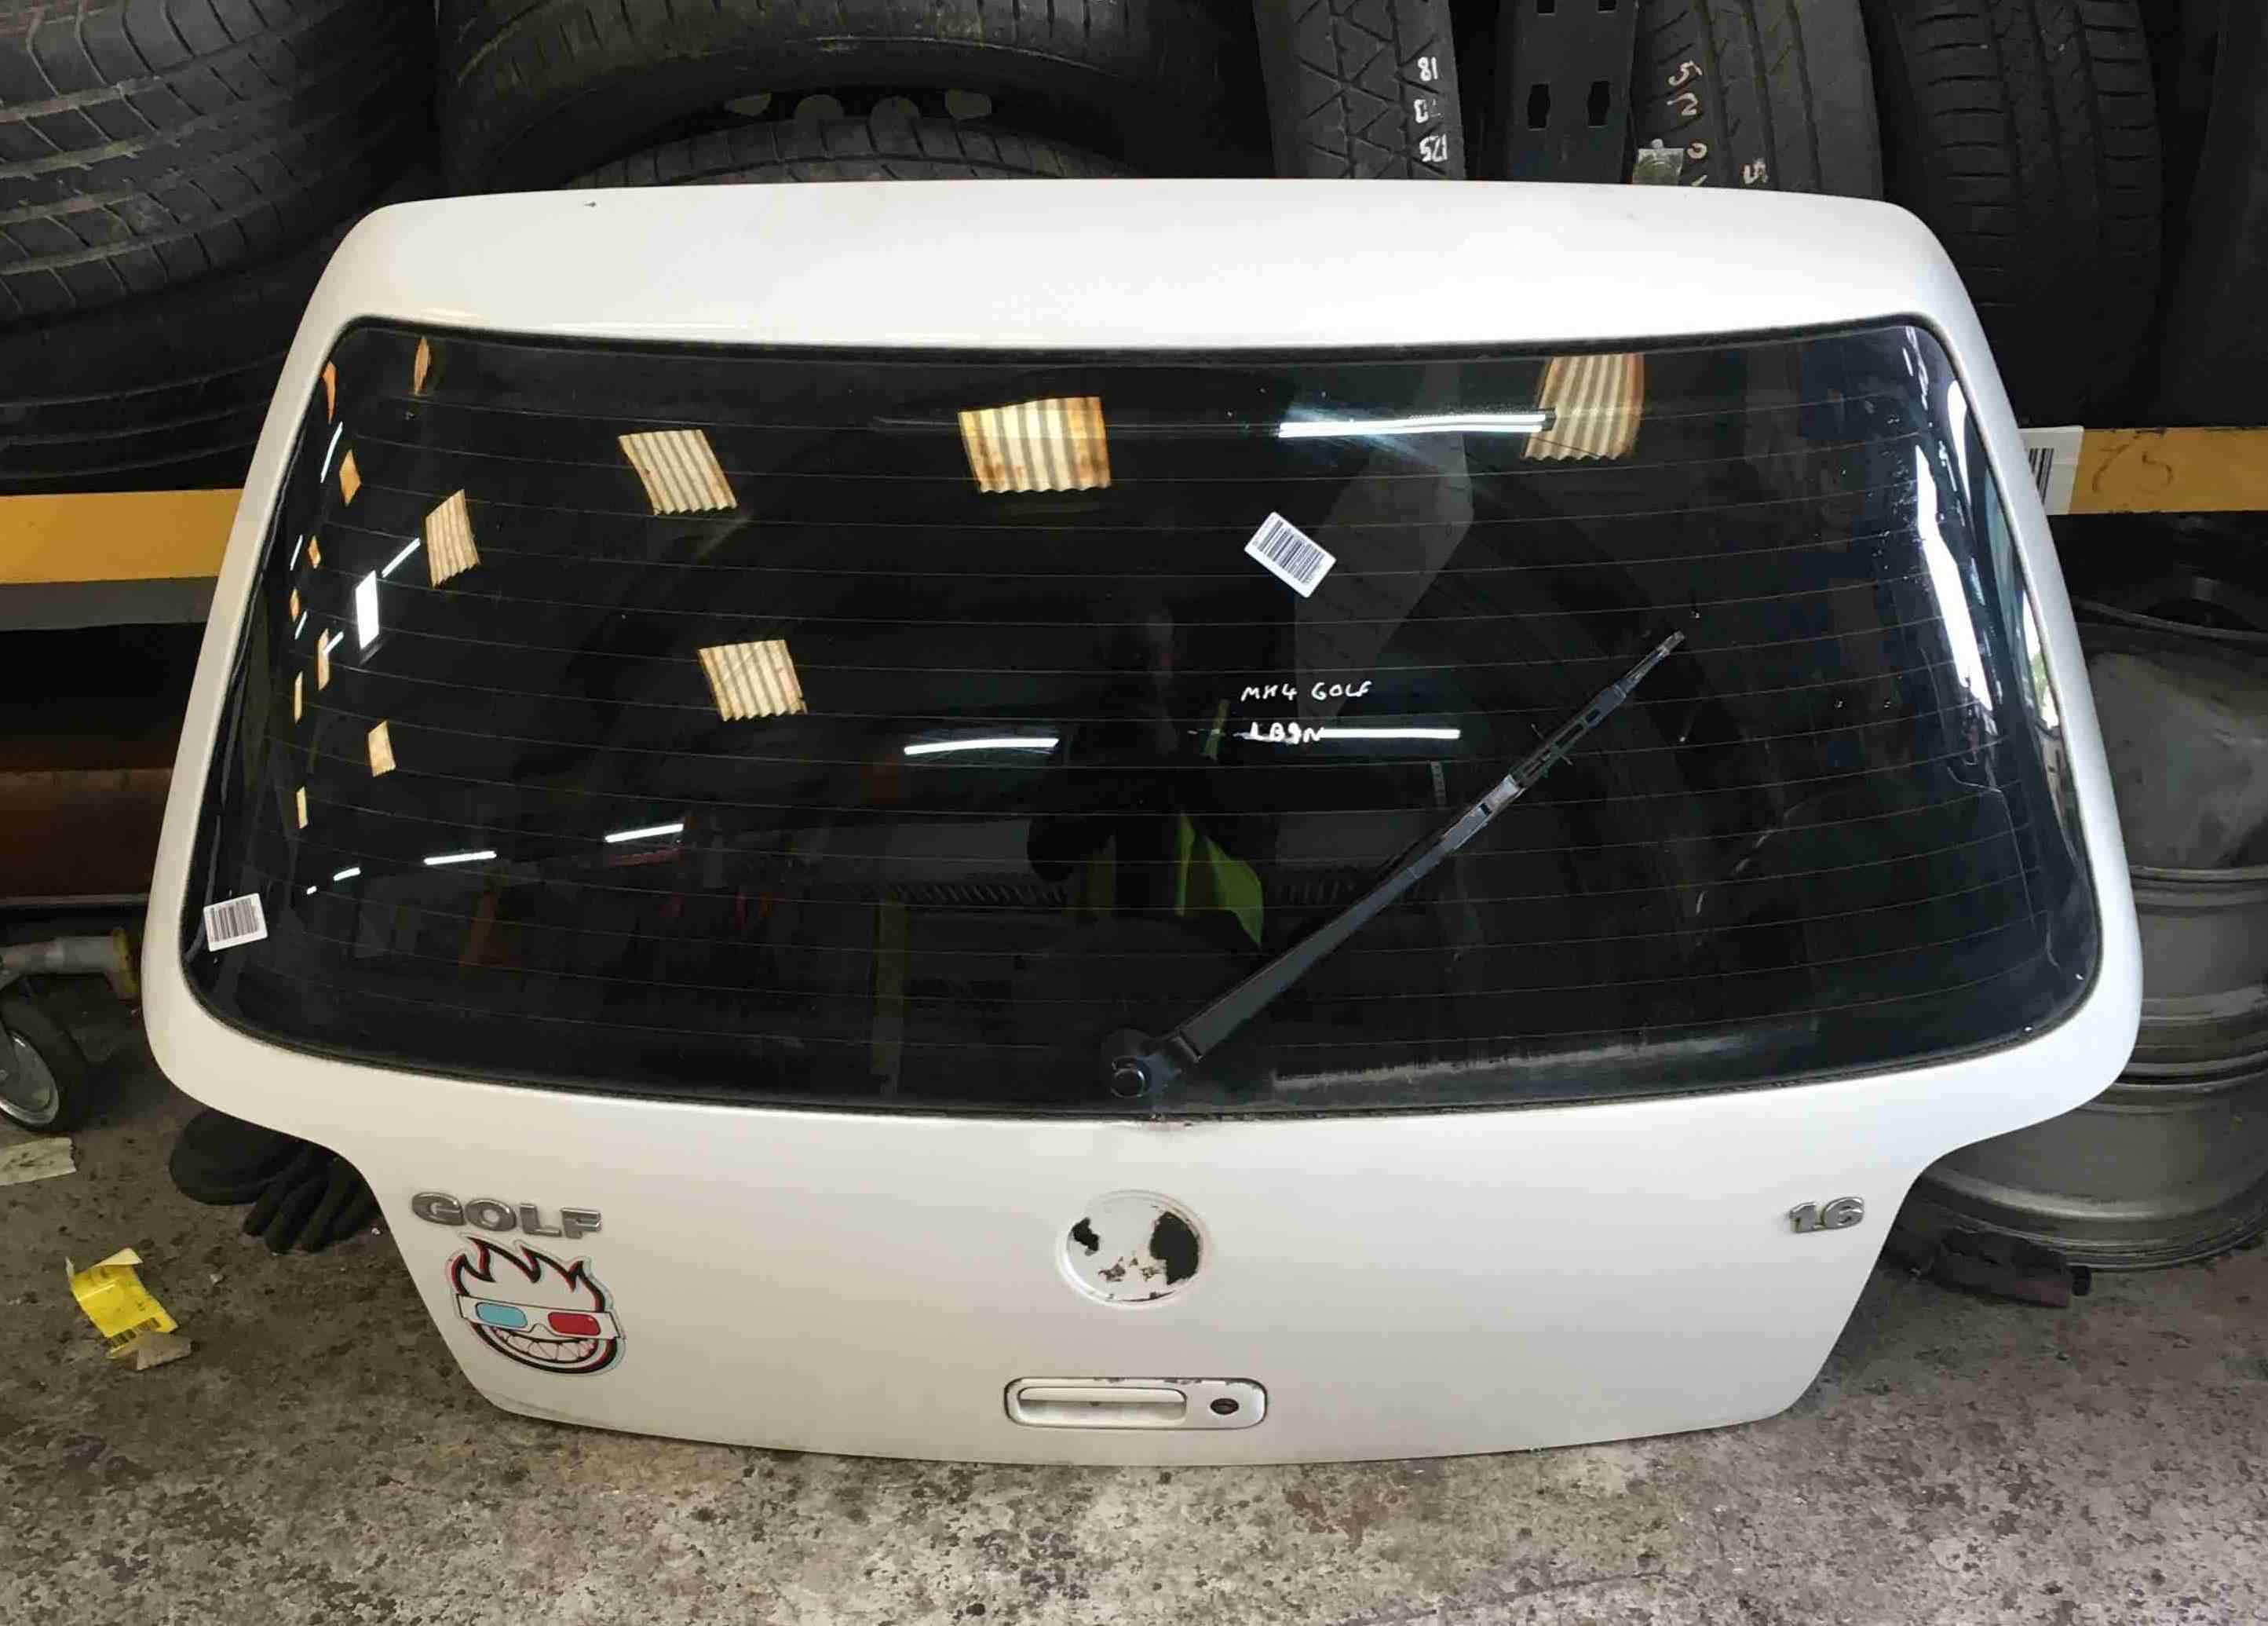 volkswagen golf mk4 1997 2004 rear boot tailgate white. Black Bedroom Furniture Sets. Home Design Ideas